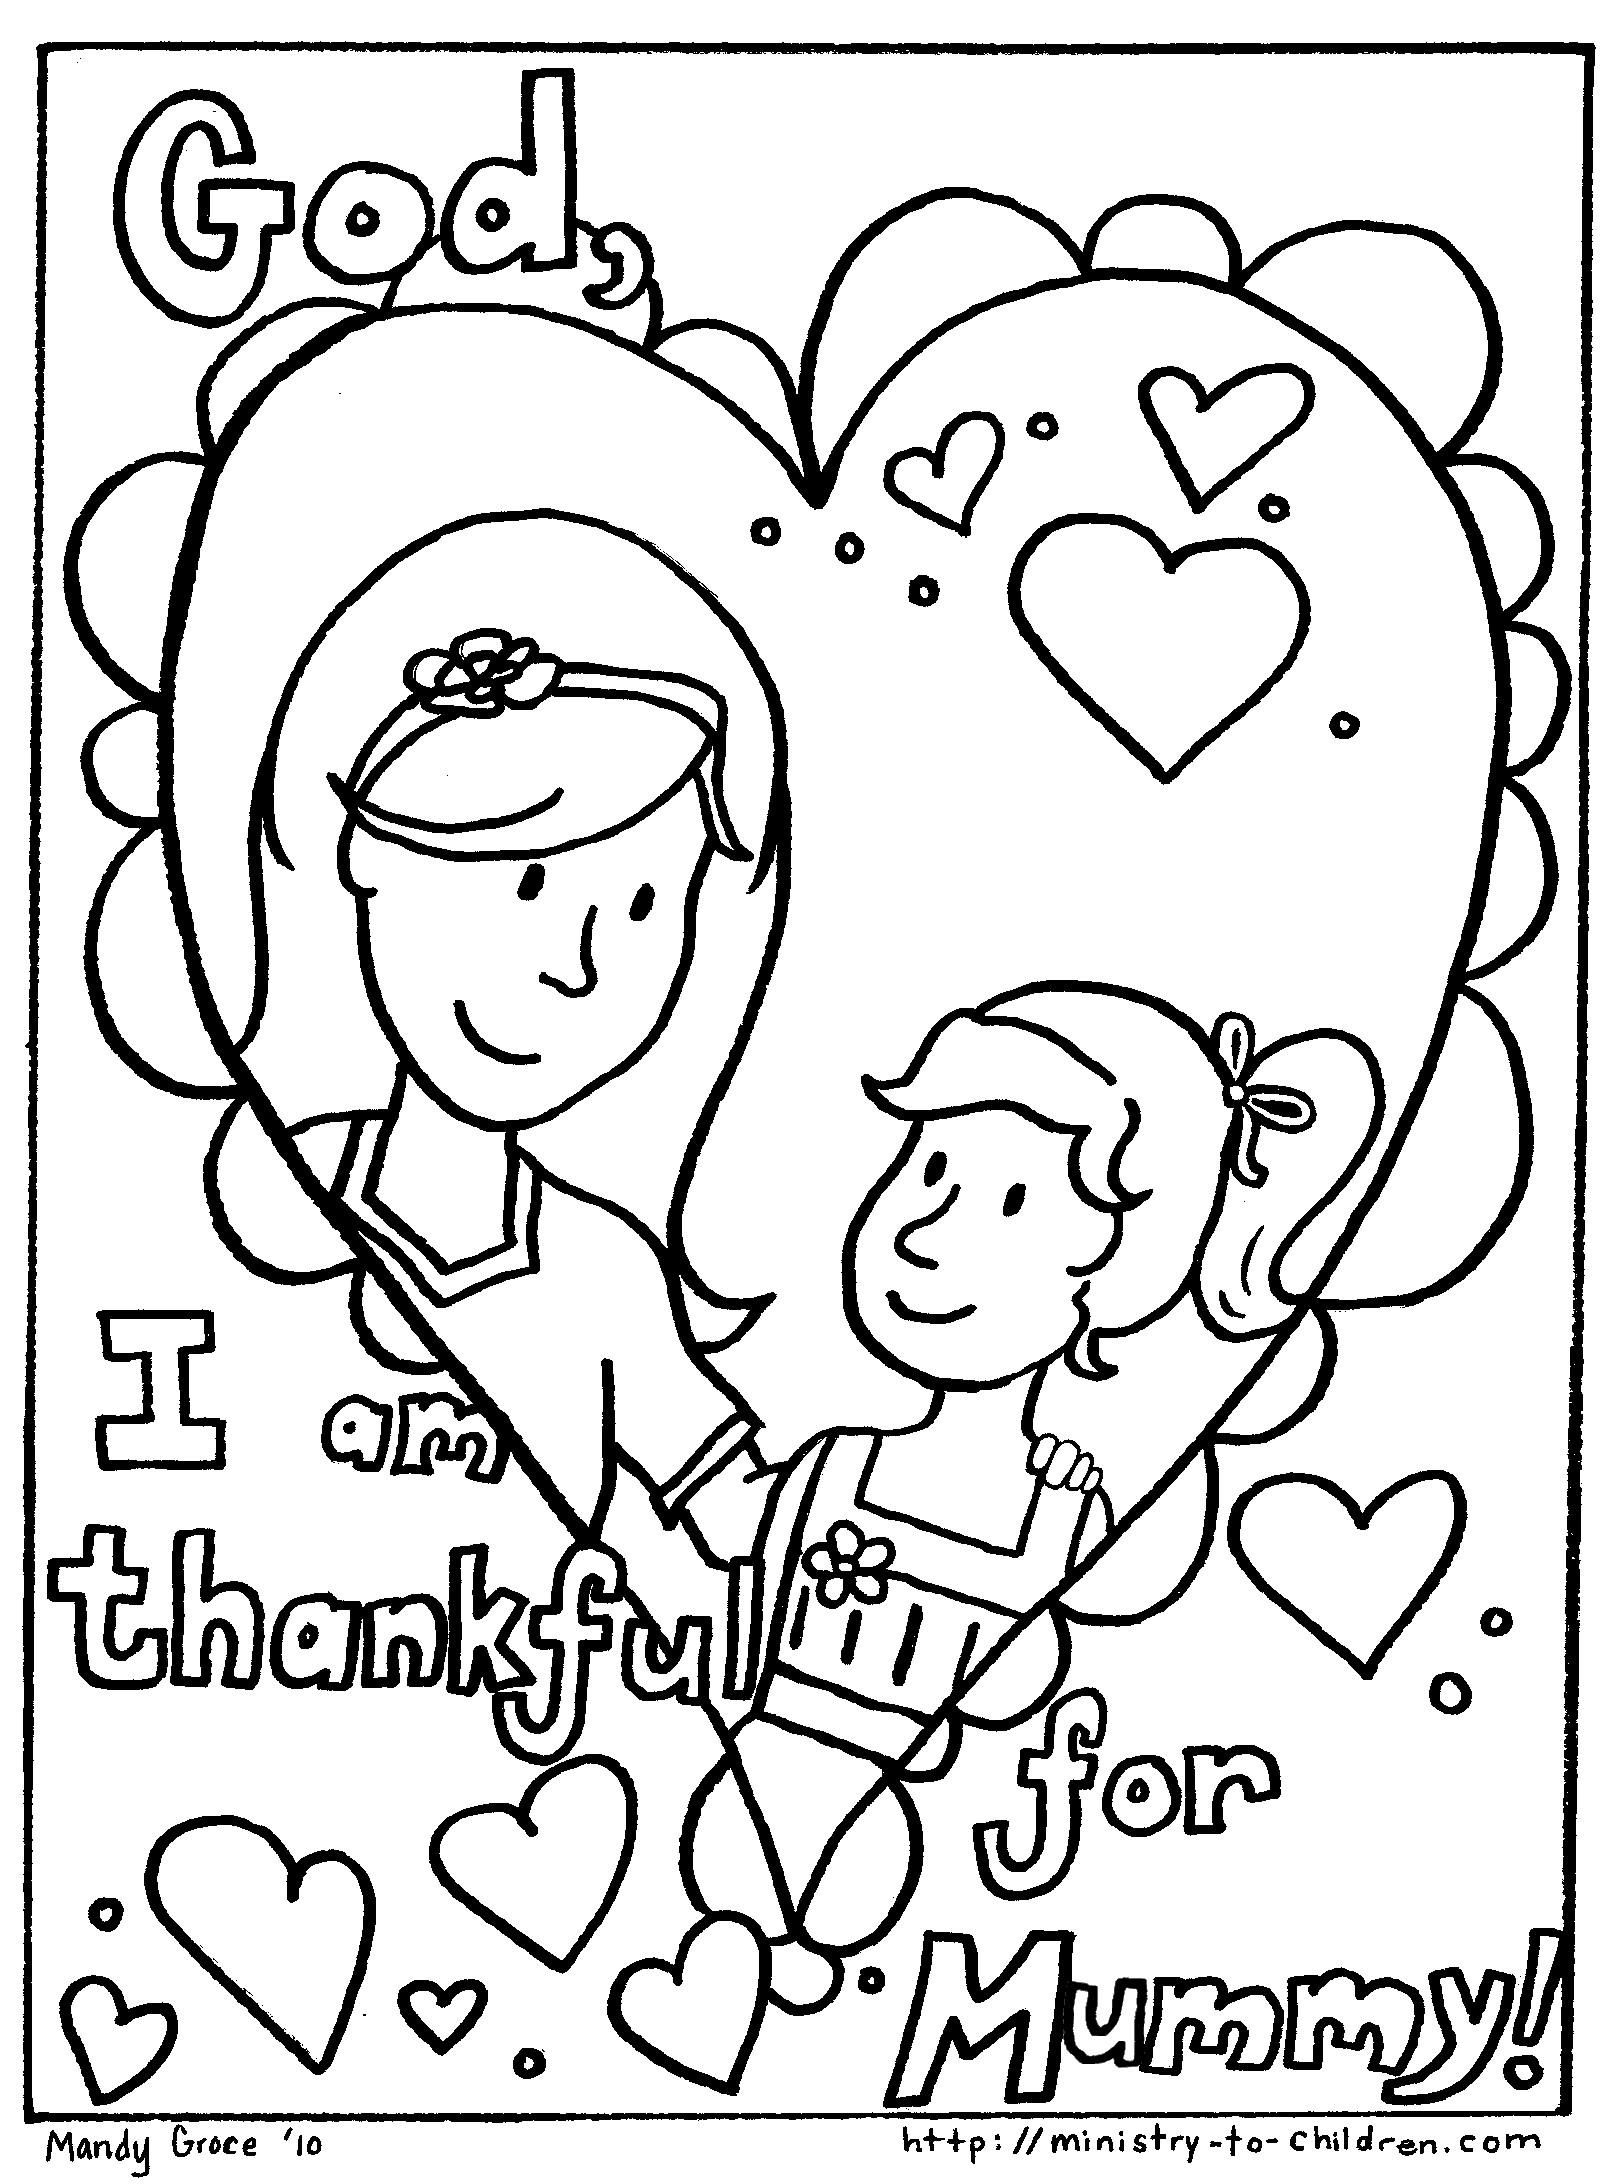 Version coloring #18, Download drawings